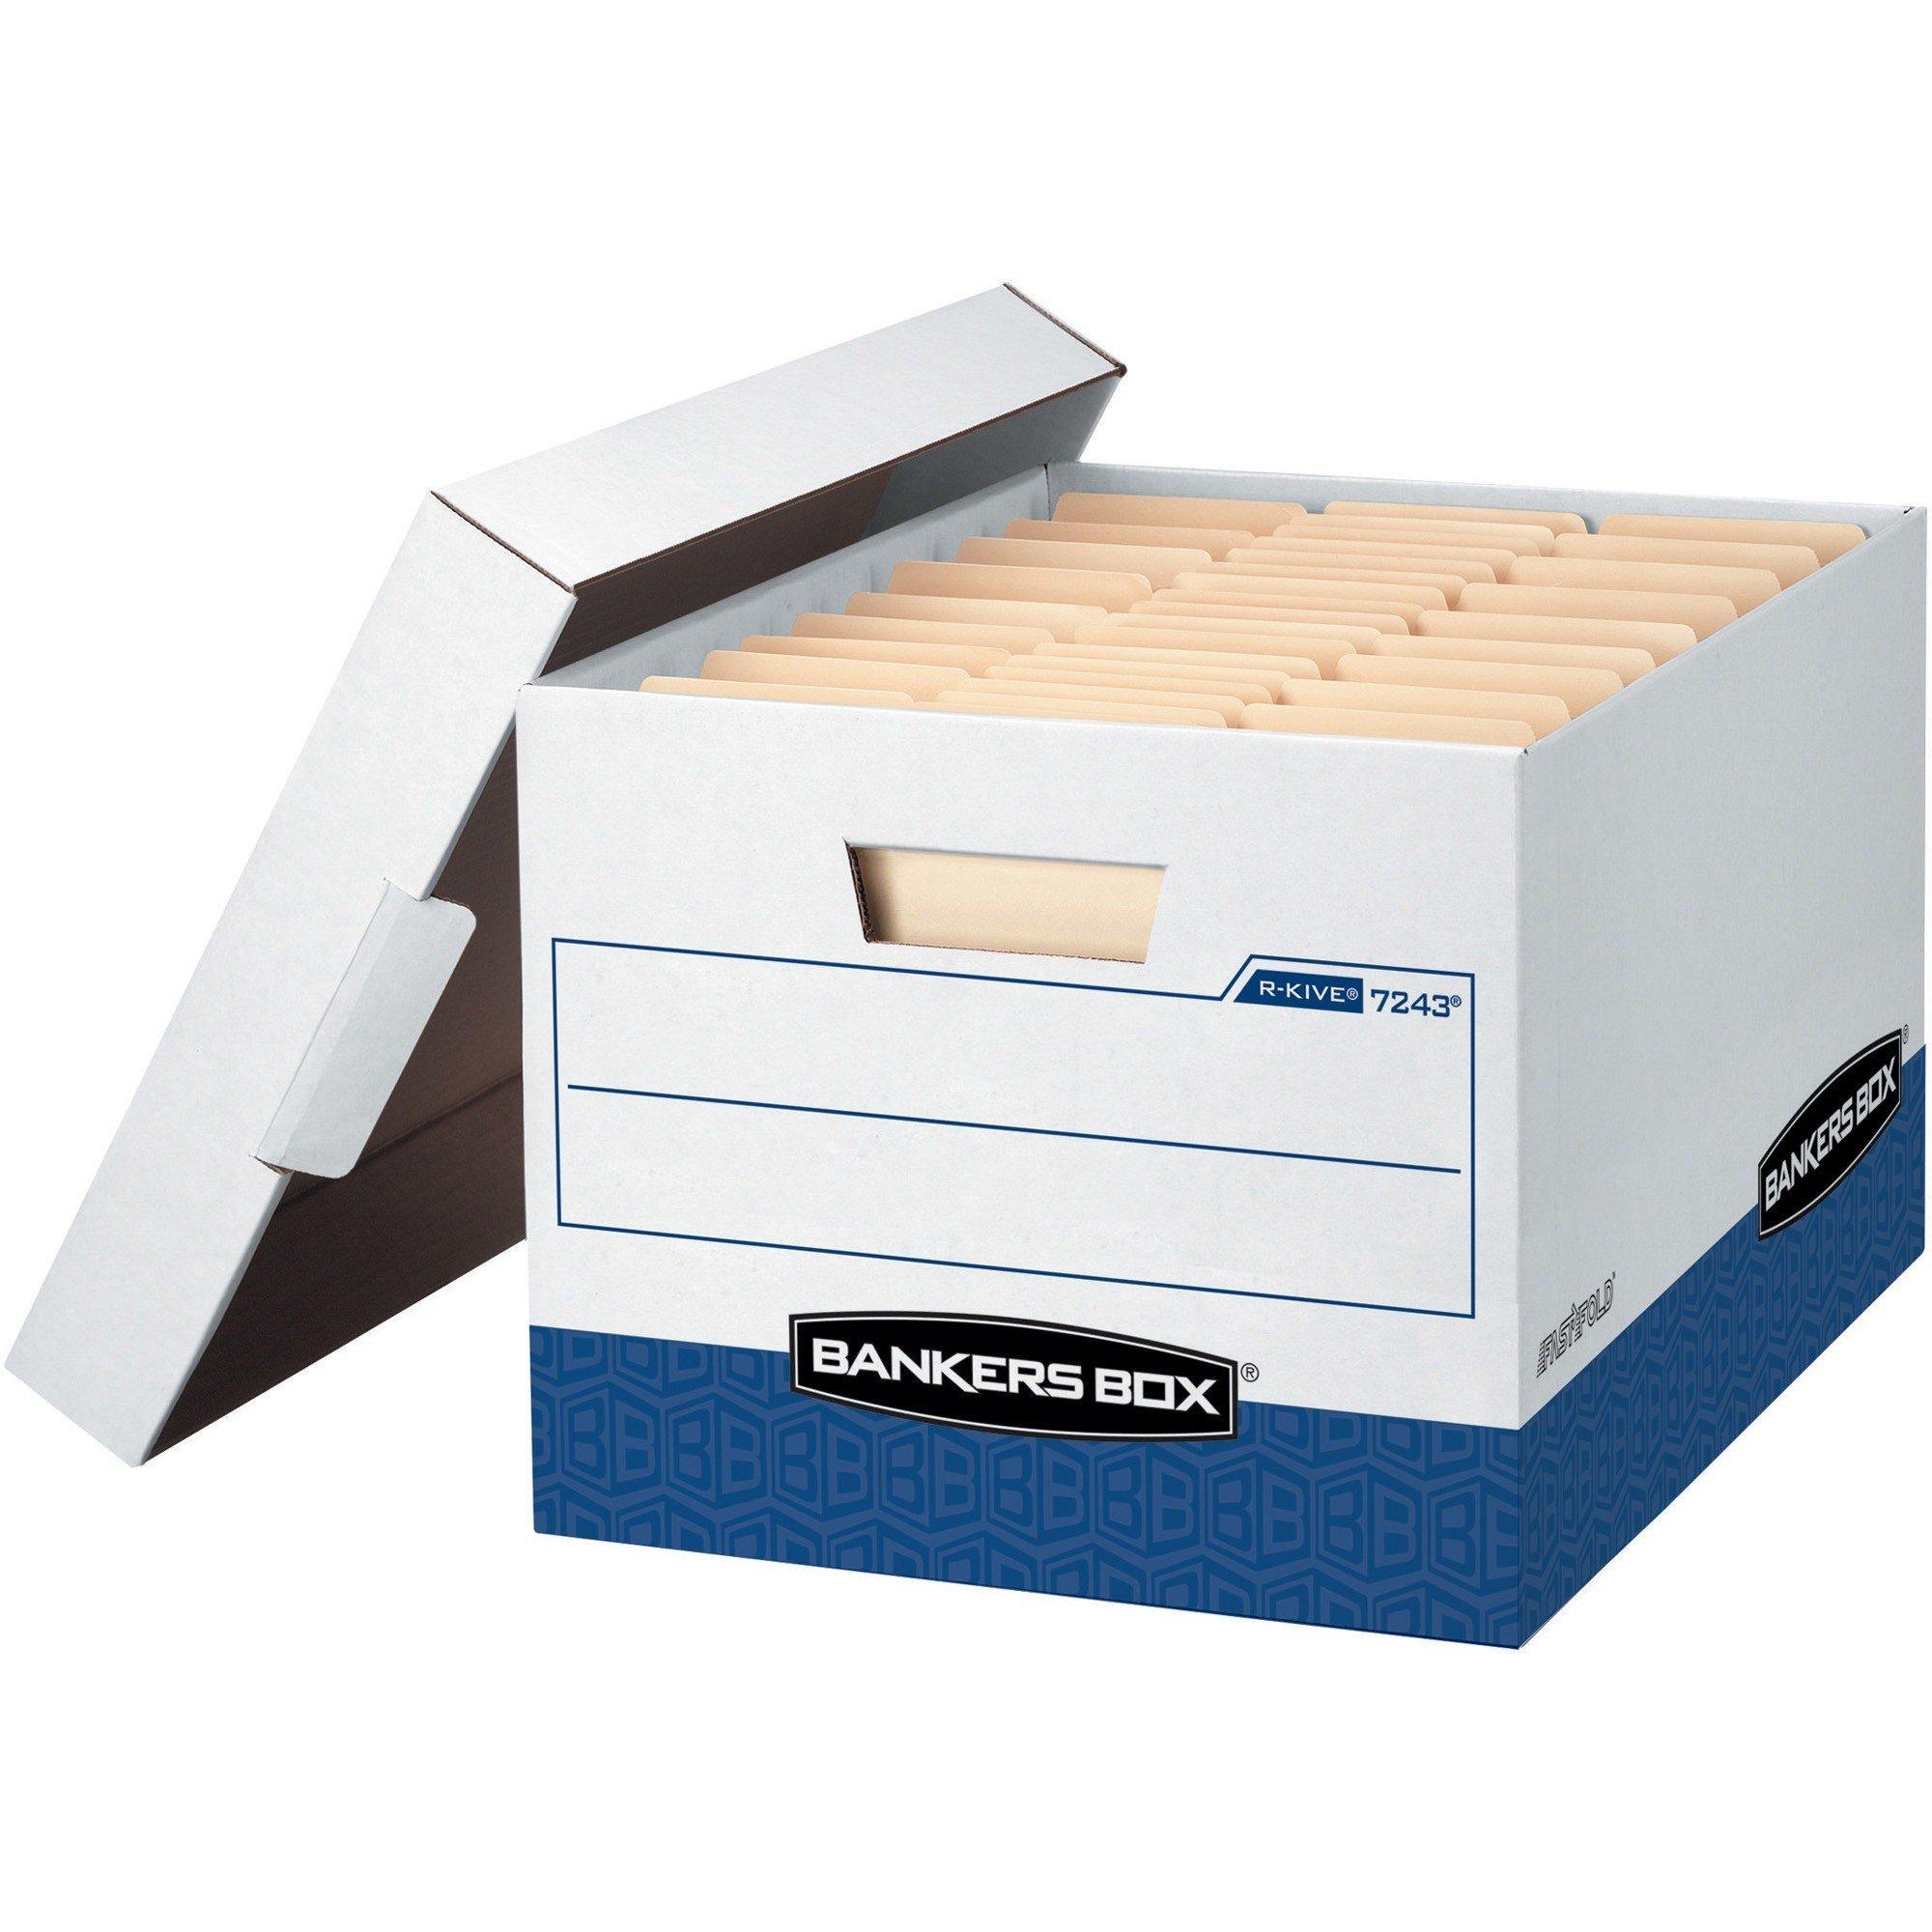 Bankers Box R-Kive - Letter/Legal, White/Blue - Each